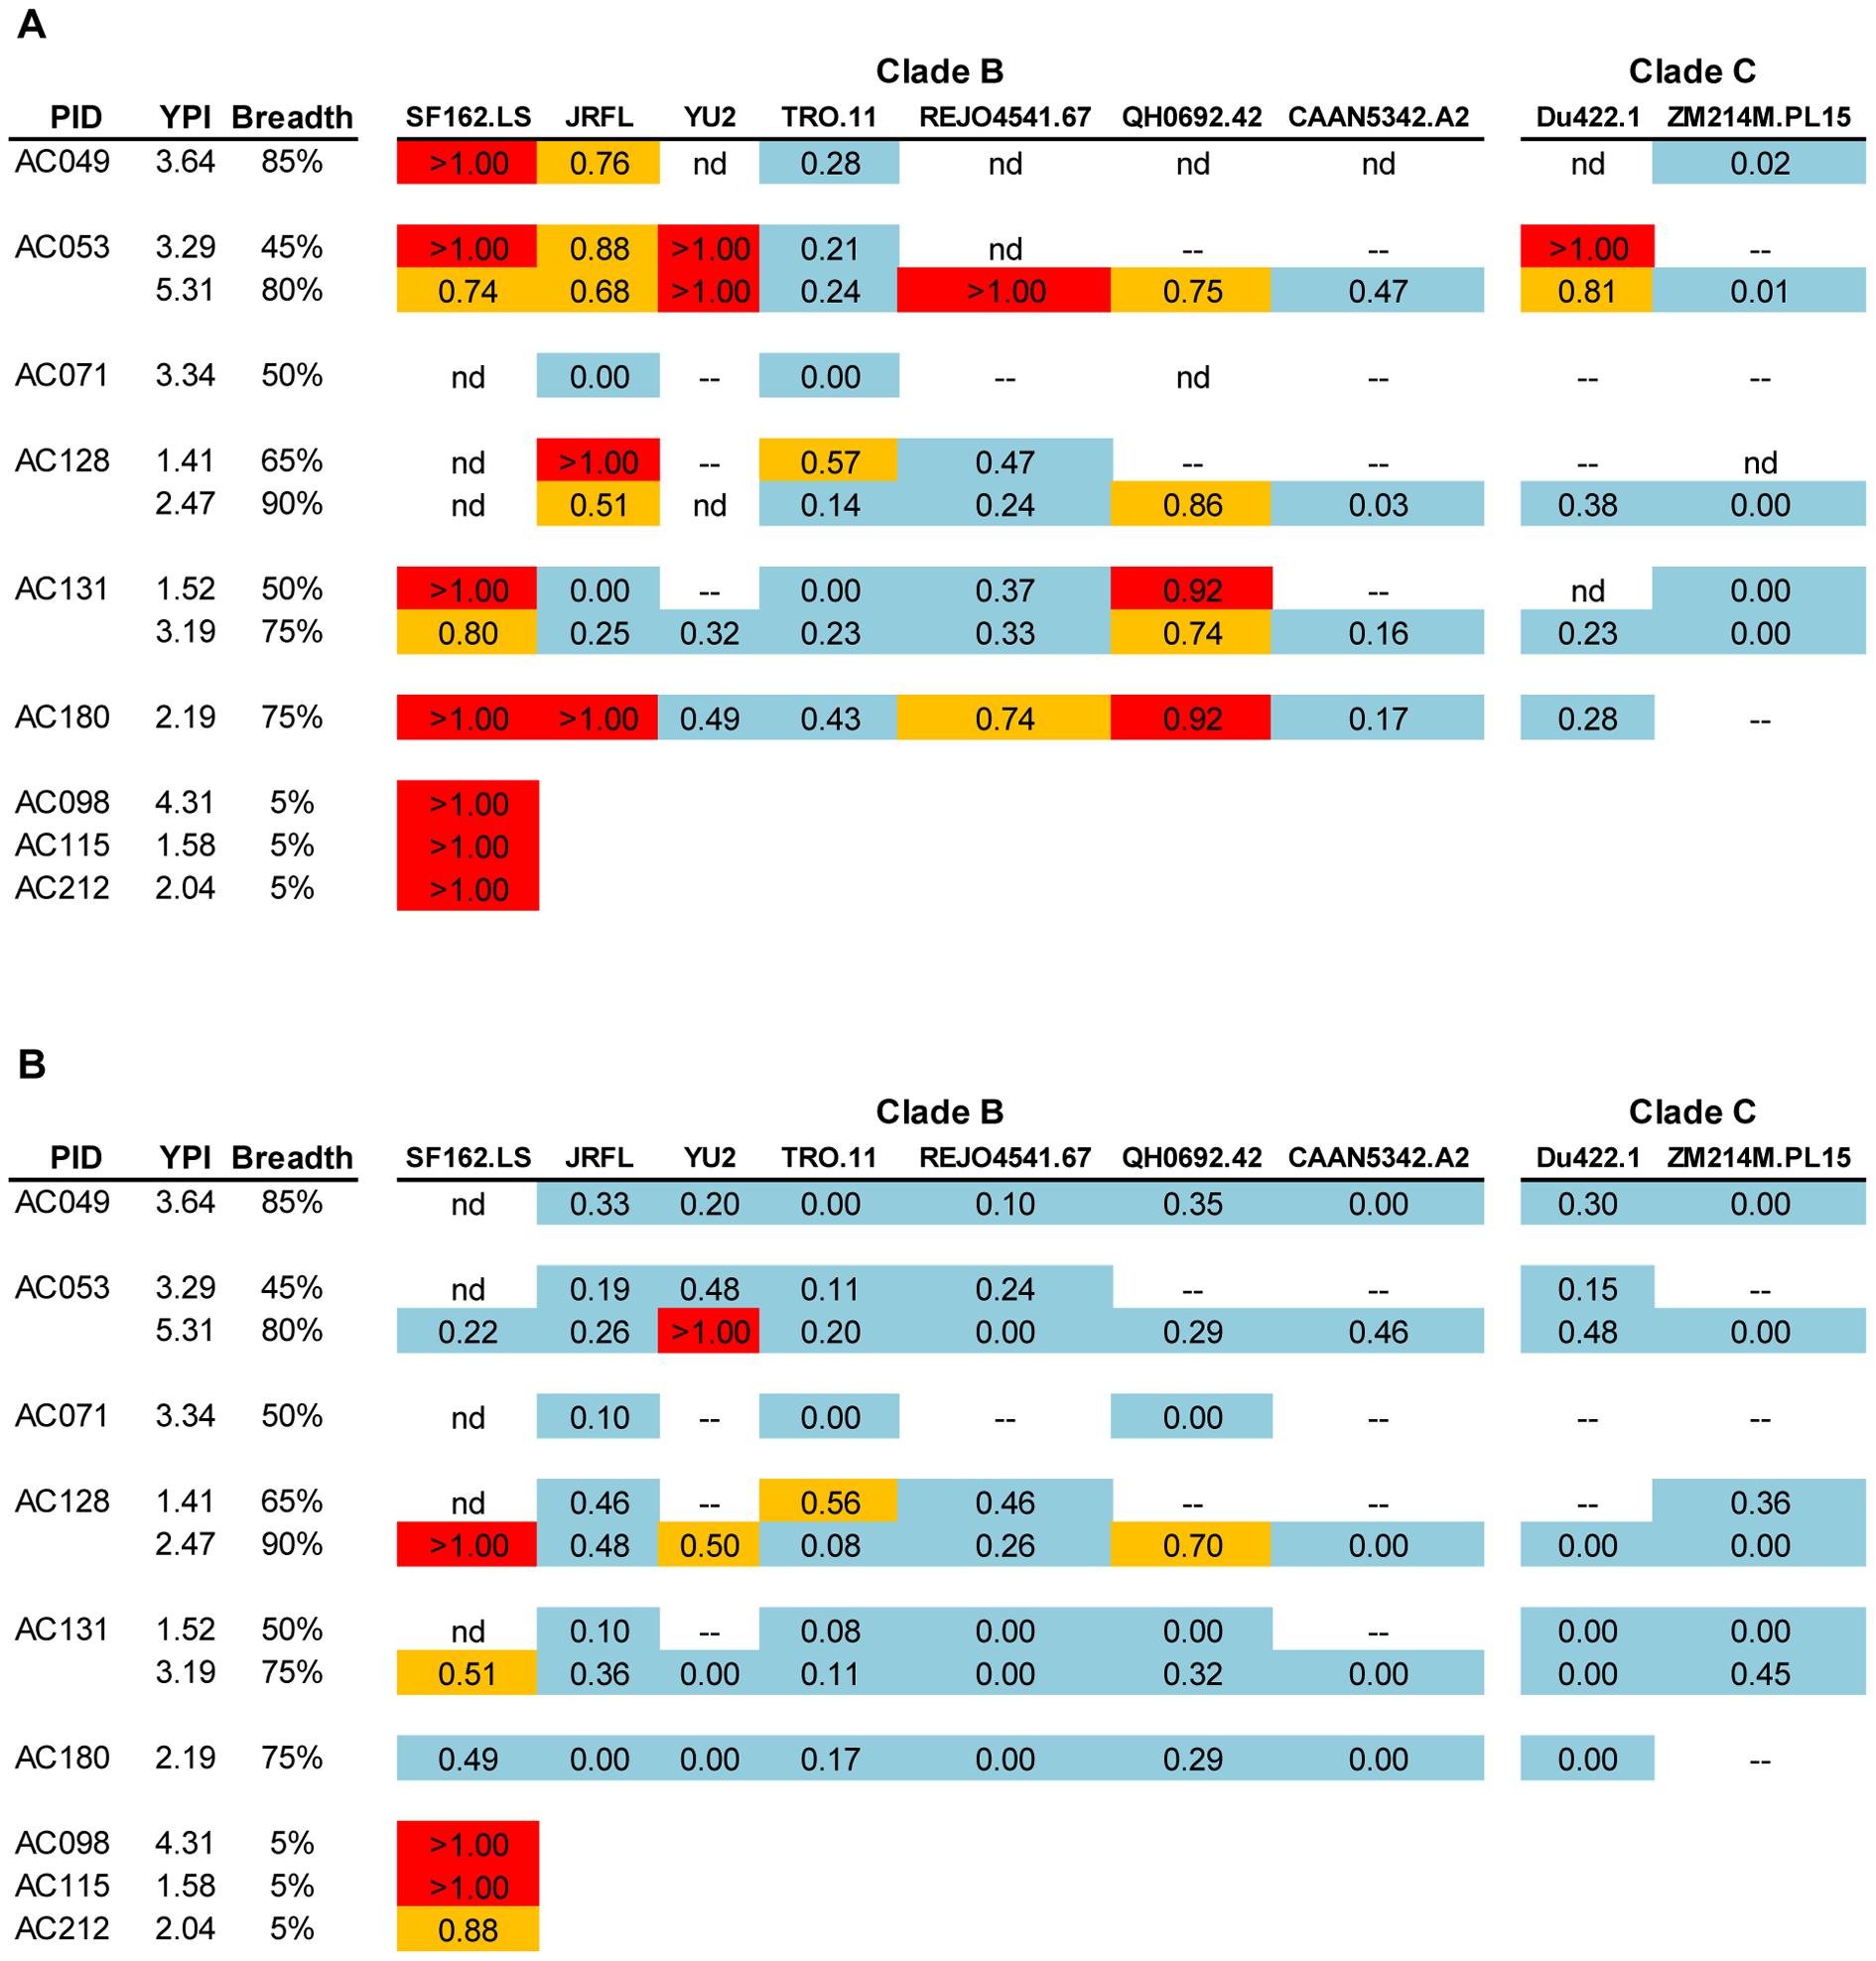 Contribution of anti-gp120 antibodies to the overall neutralizing activity of HIV+ plasmas.